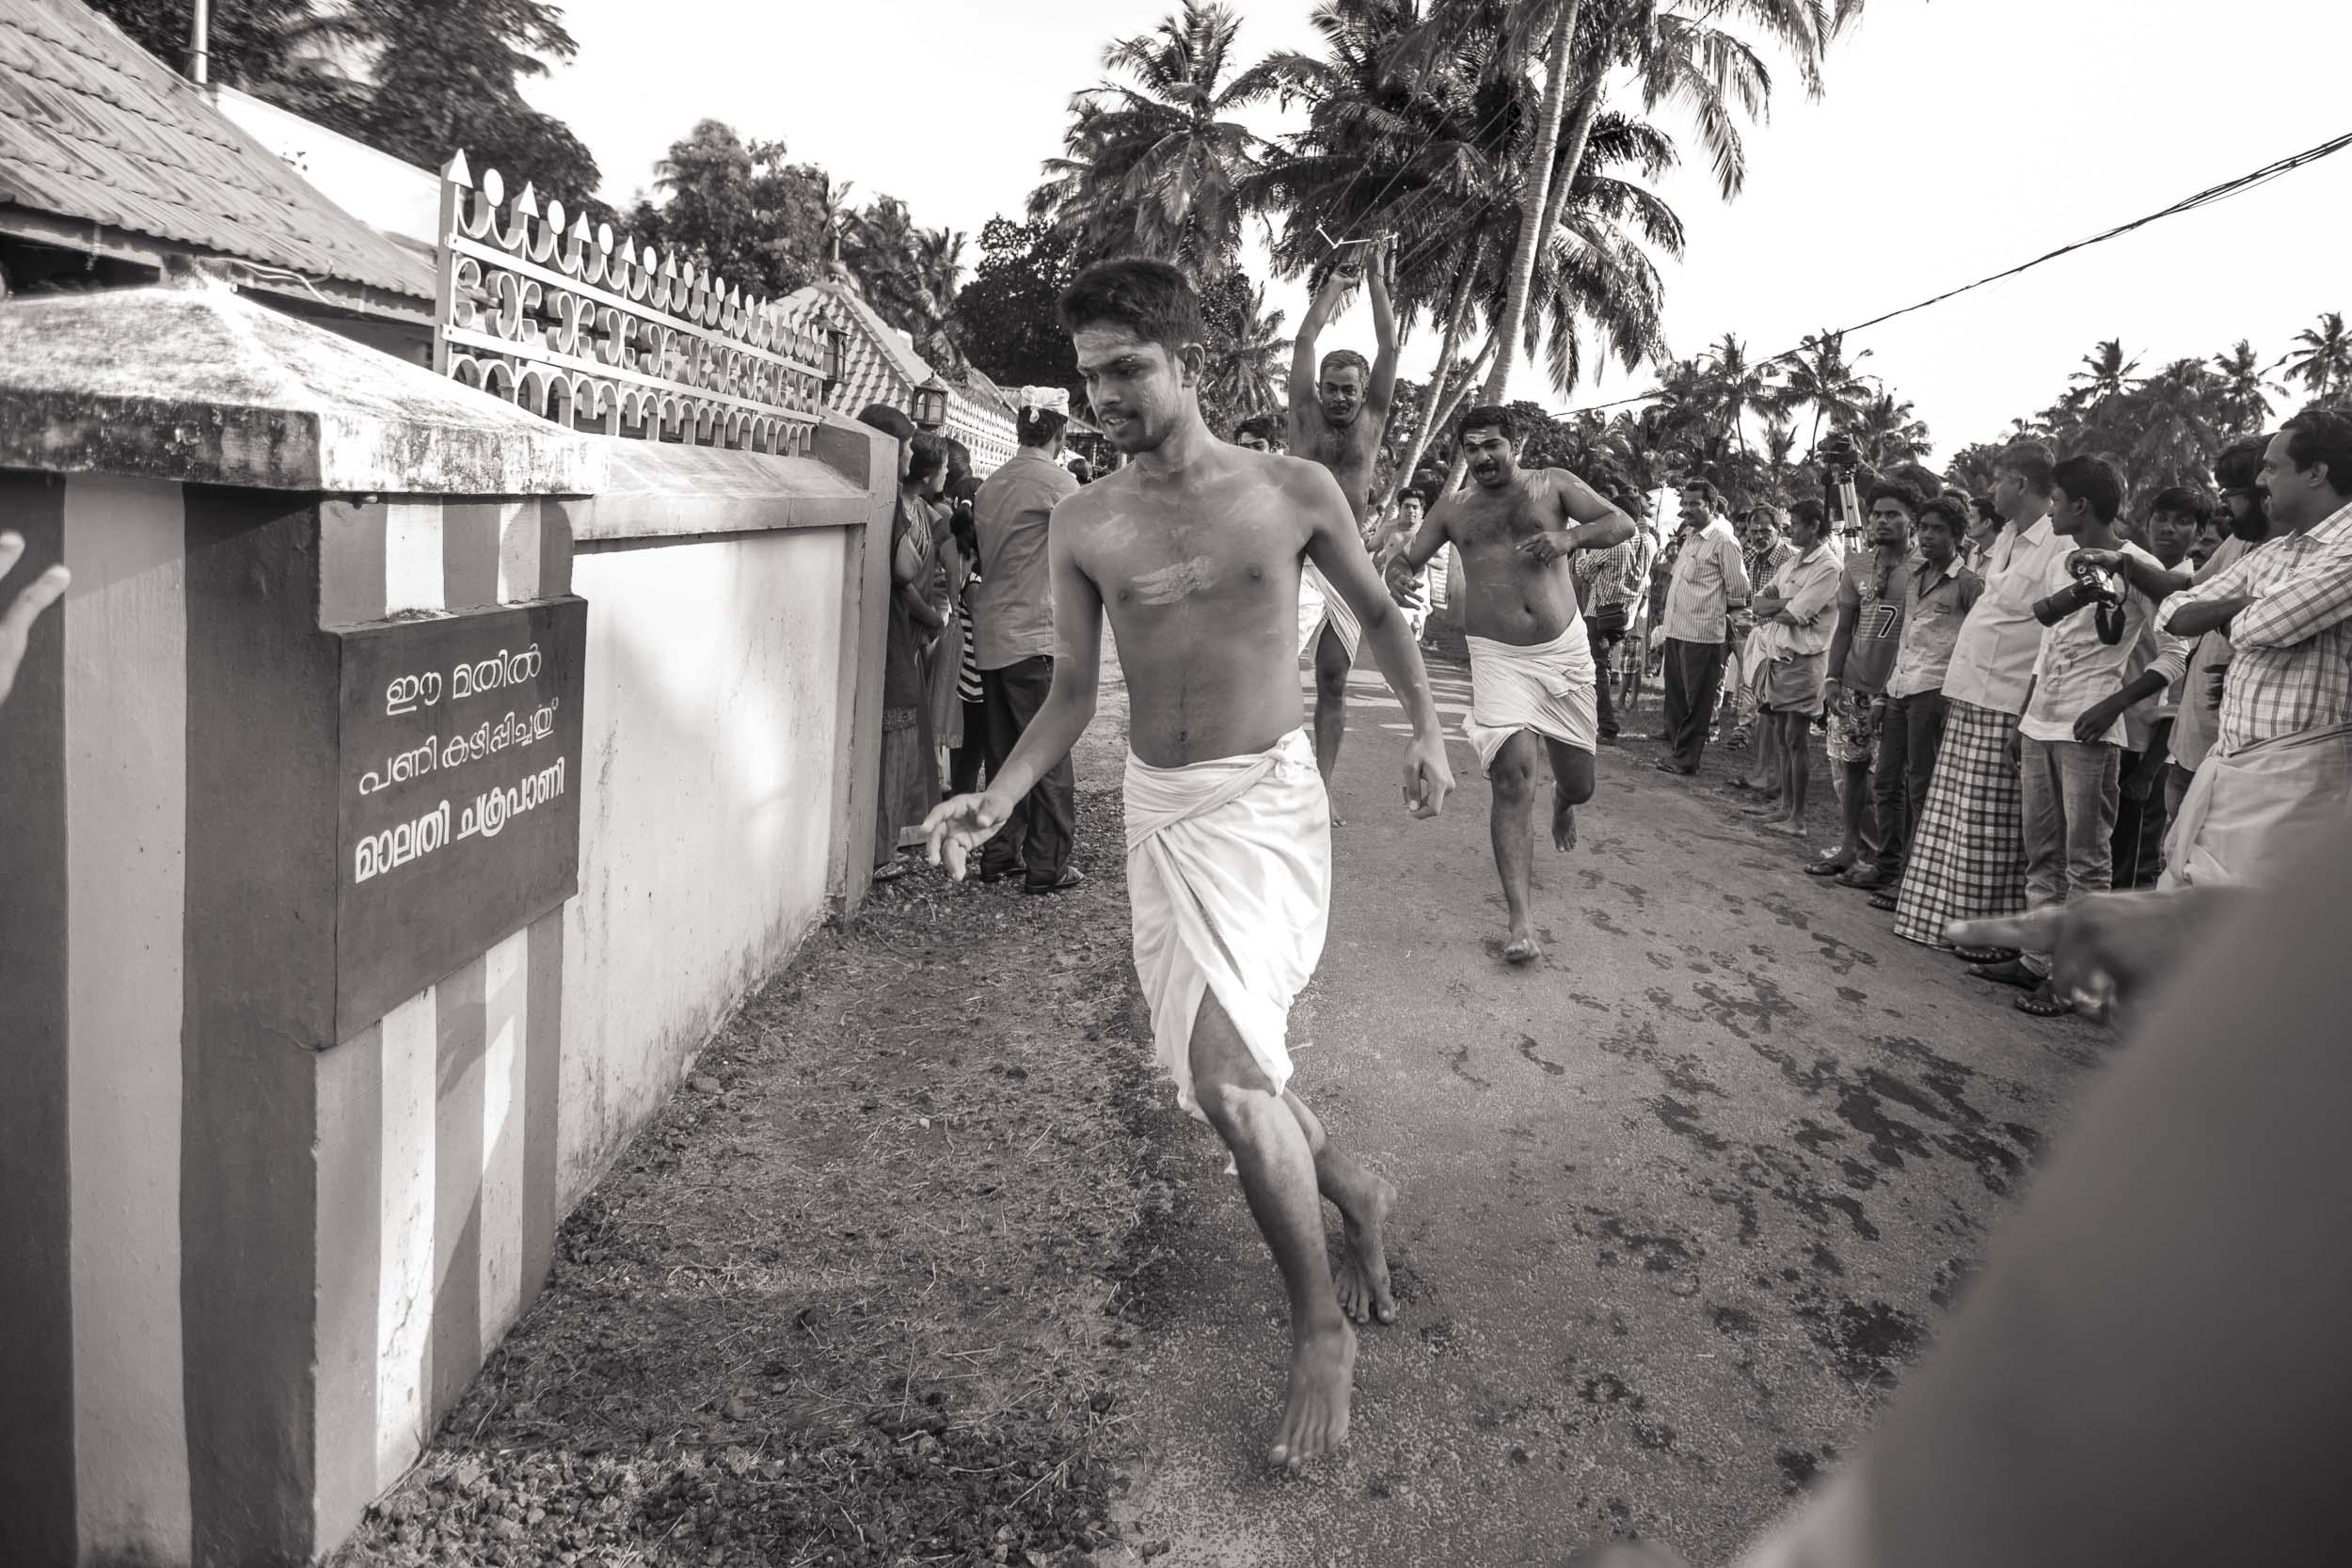 Sindhur_Photography_Travel_People_Kerala-23.JPG